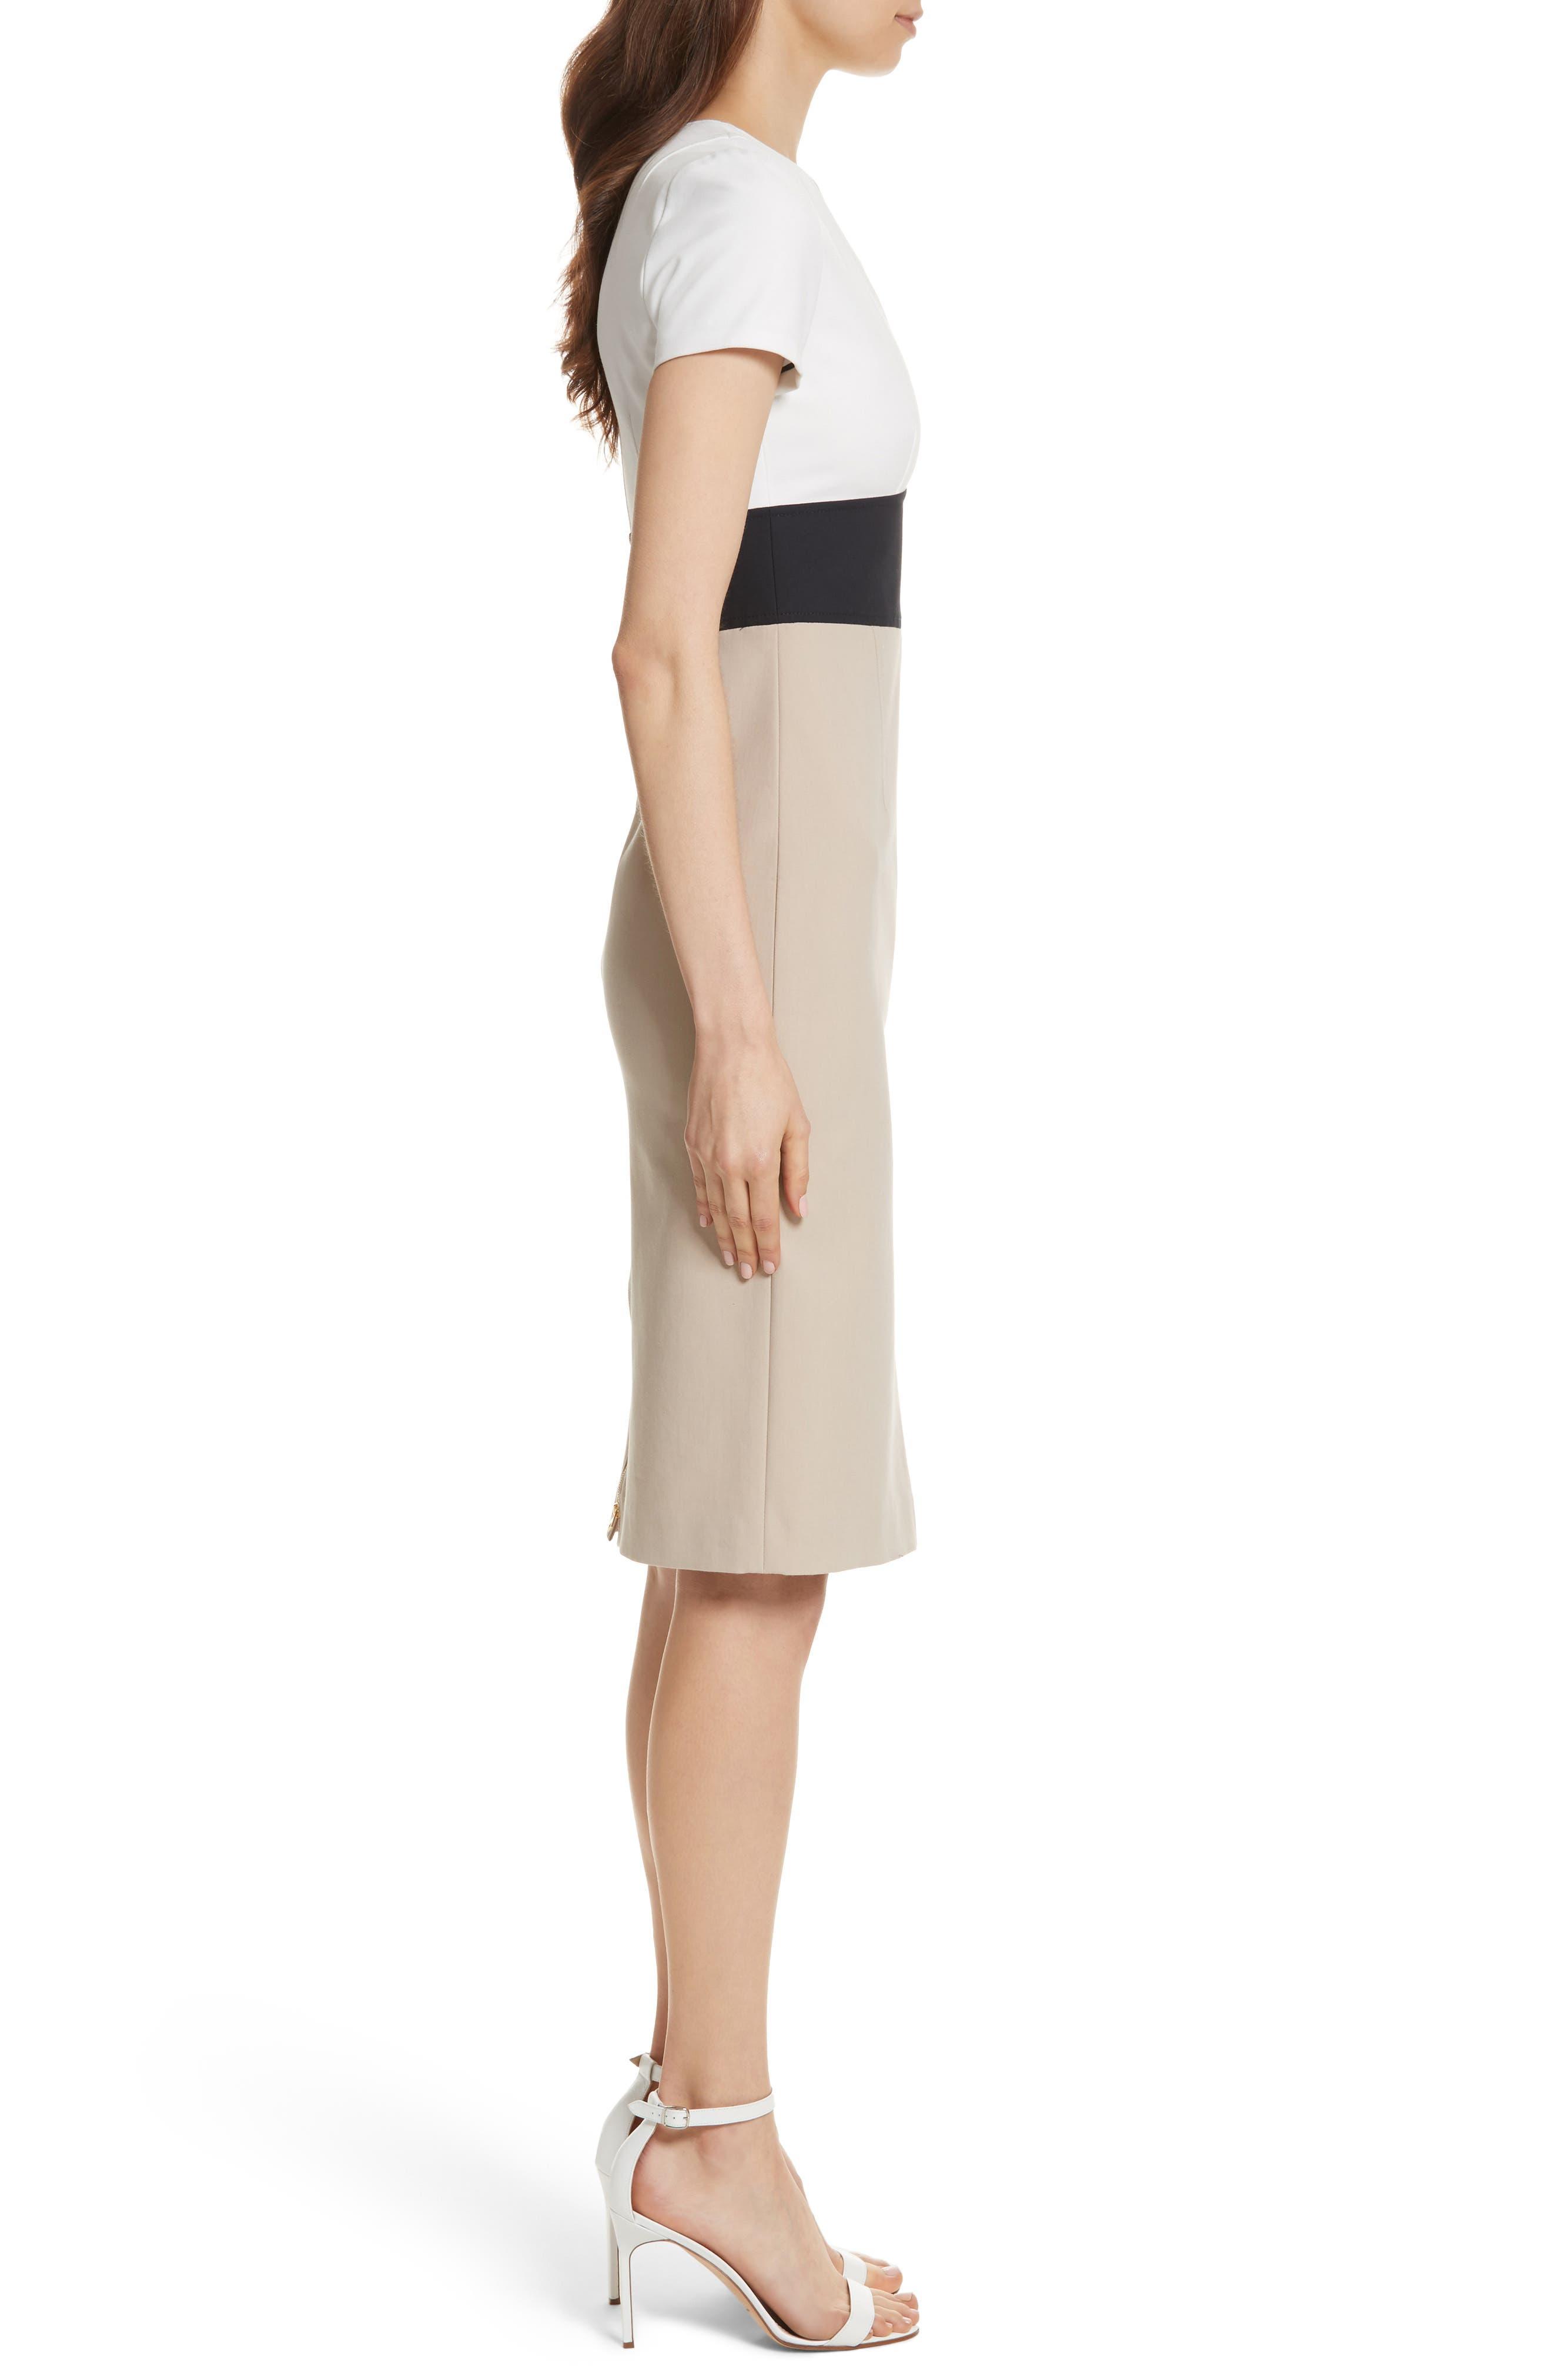 Diane von Furstenberg Colorblock Stretch Cotton Blend Sheath Dress,                             Alternate thumbnail 3, color,